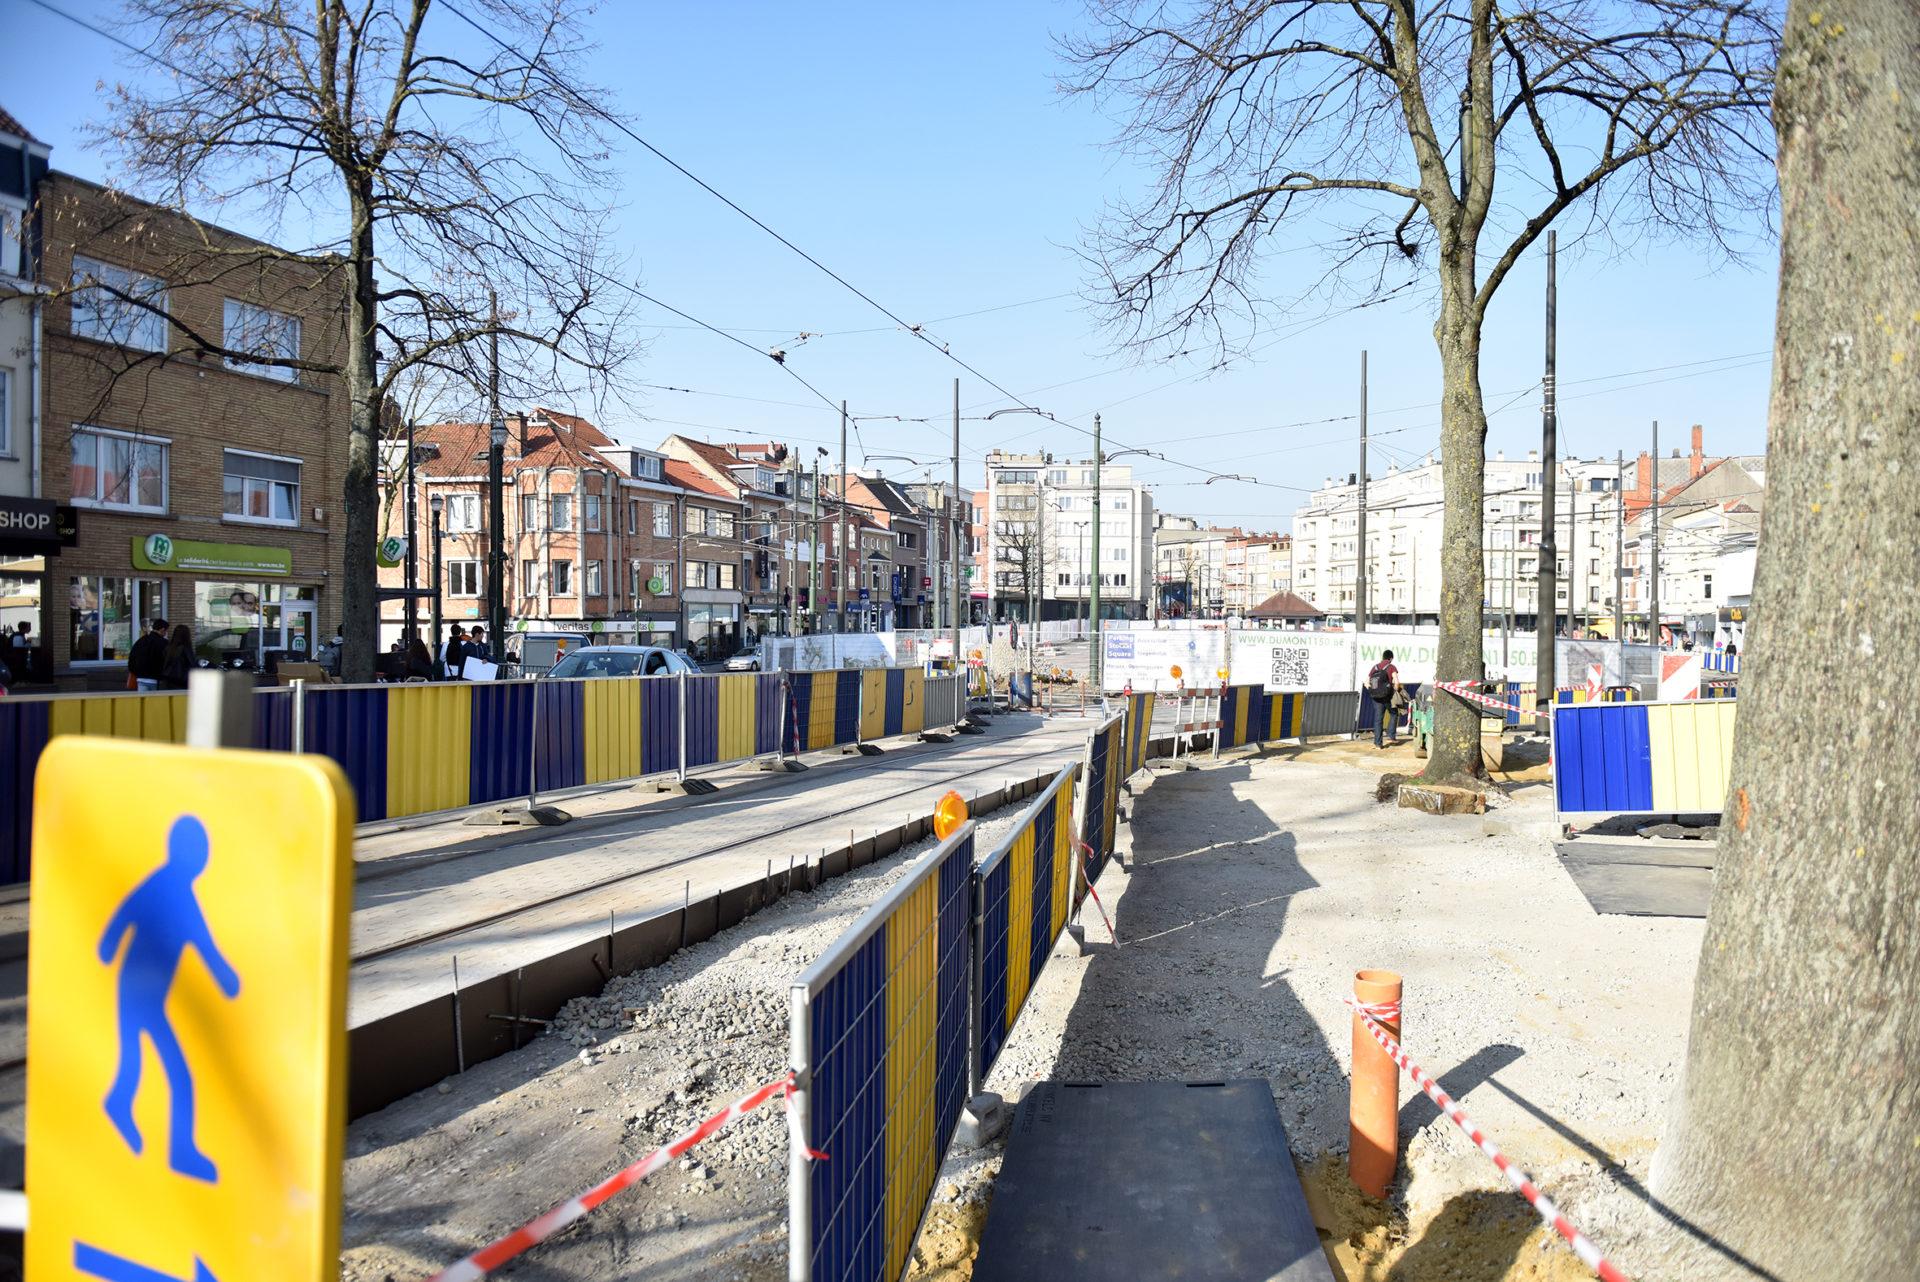 Place Dumon Dumonplein 51